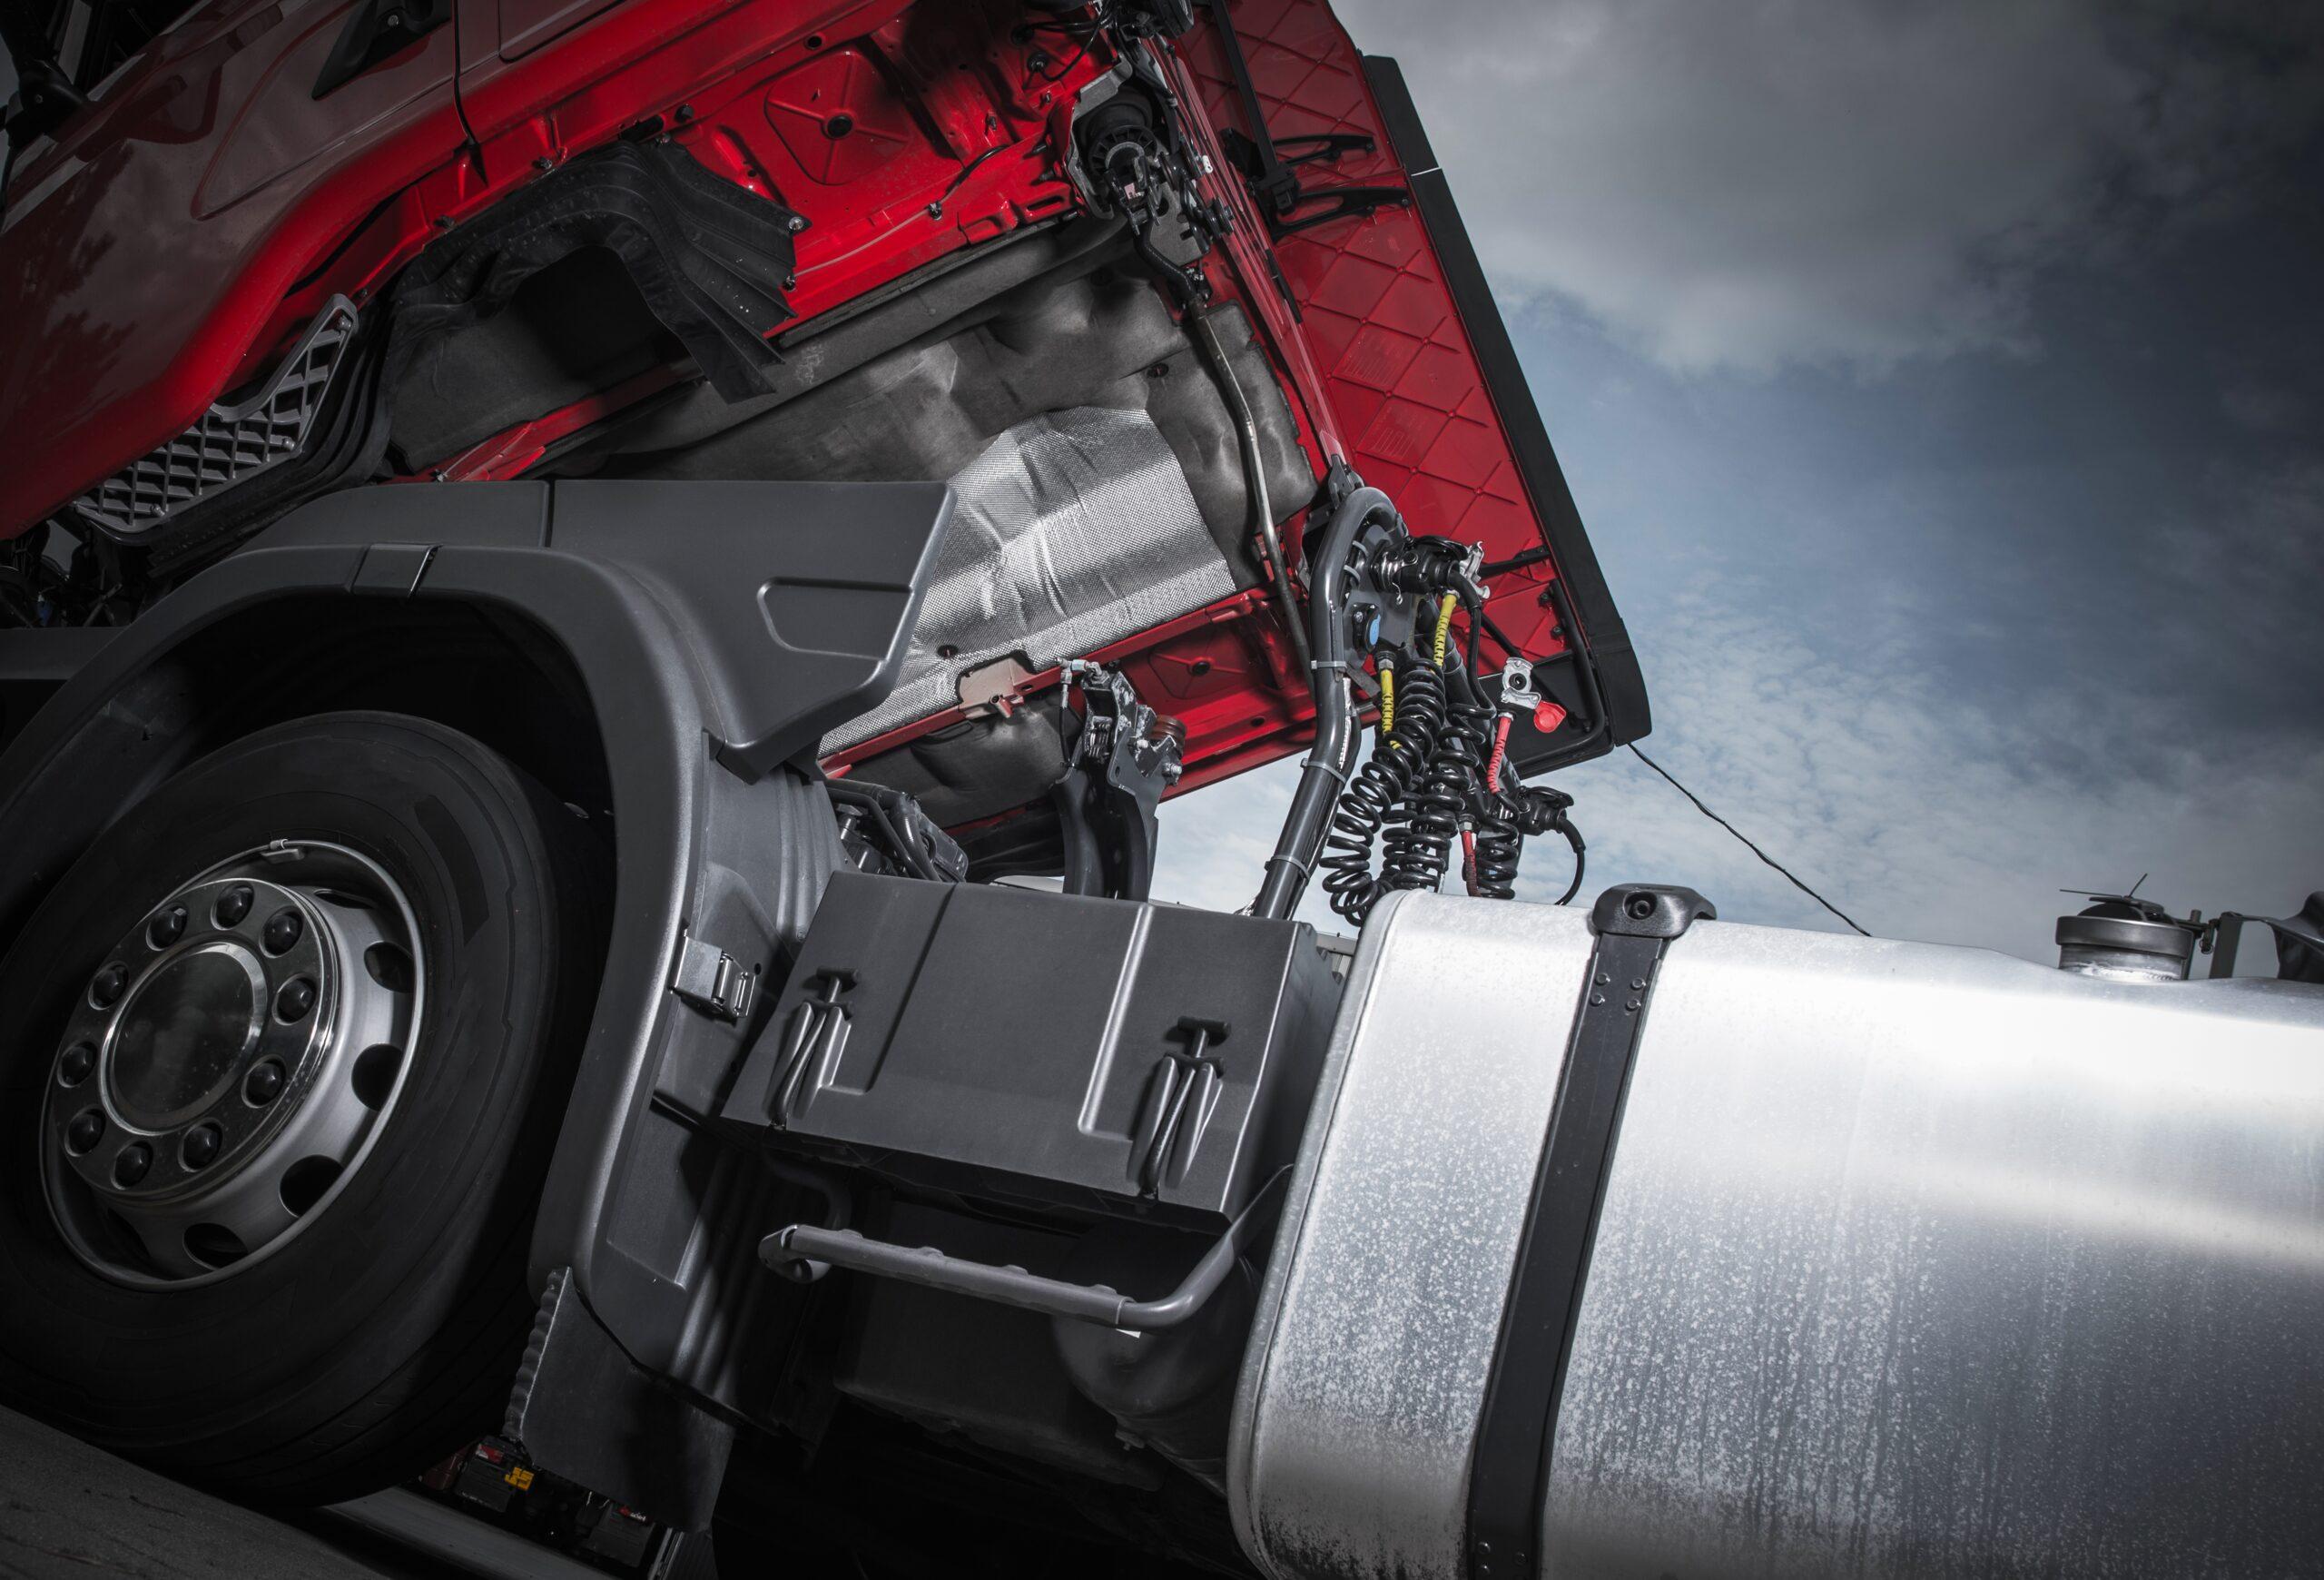 Truck Repair Maintenance